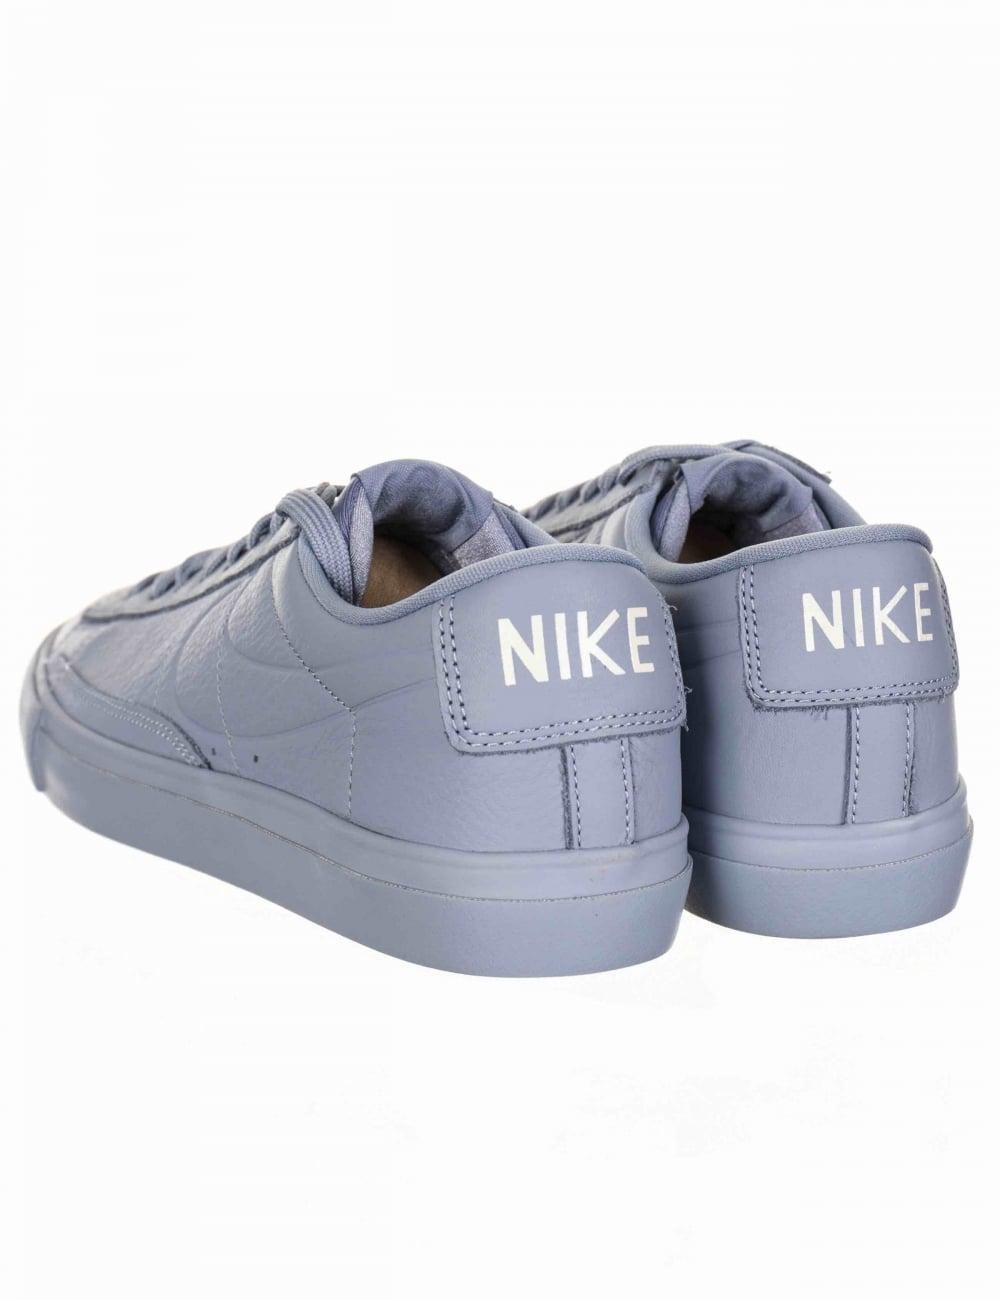 bf1d177f98a Nike Blazer Low Trainers - Glacier Grey - Footwear from Fat Buddha ...